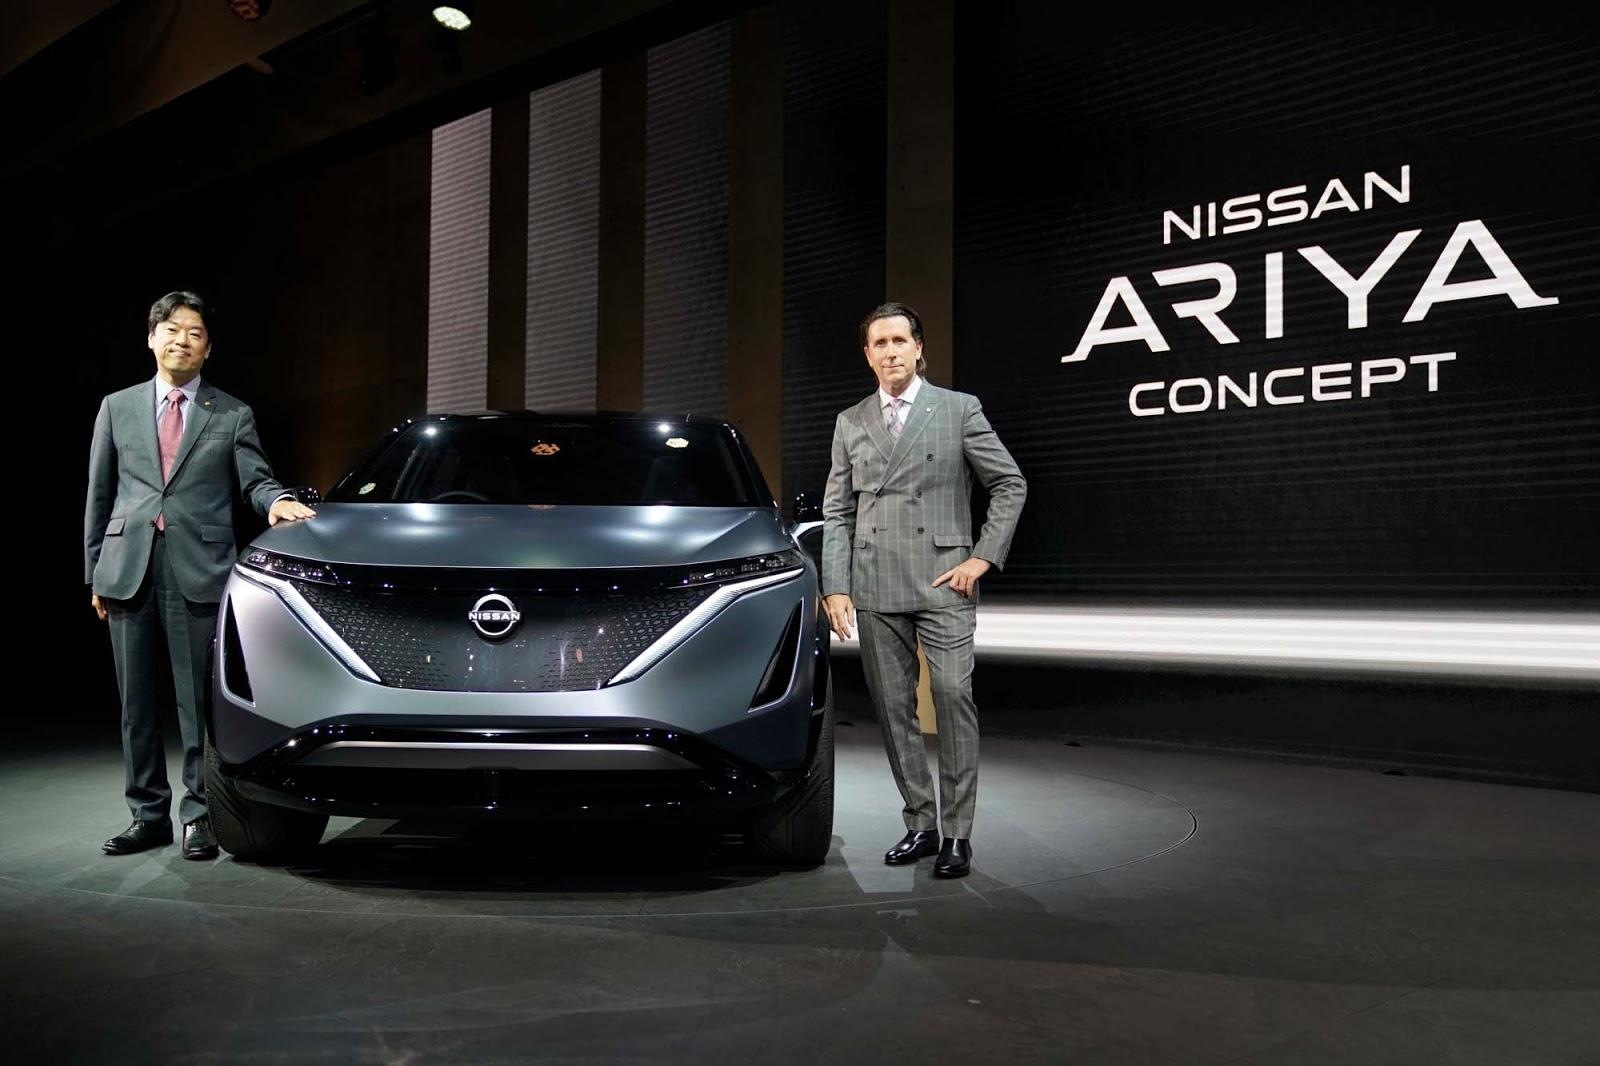 Press2BCOnference2BCam2B3 Με αυτό το μοντέλο η Nissan μας δείχνει το μέλλον της Electric cars, Nissan, Έκθεση, ιαπωνικά